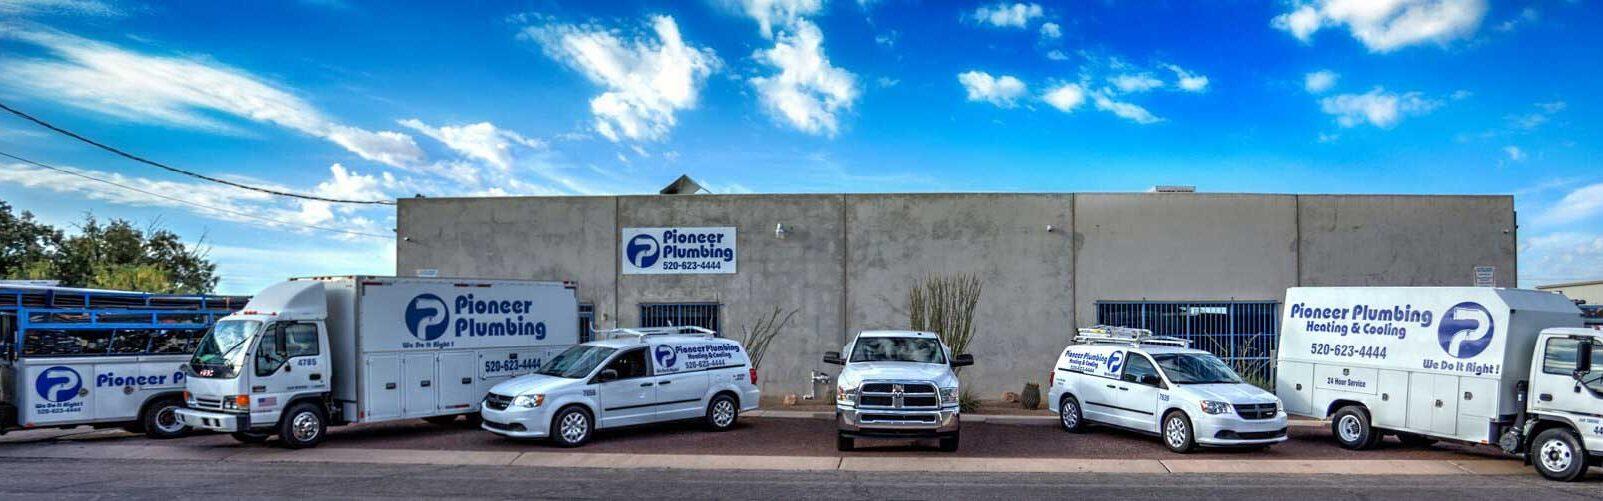 Pioneer Plumbing: Tucson Plumber and HVAC Contractor